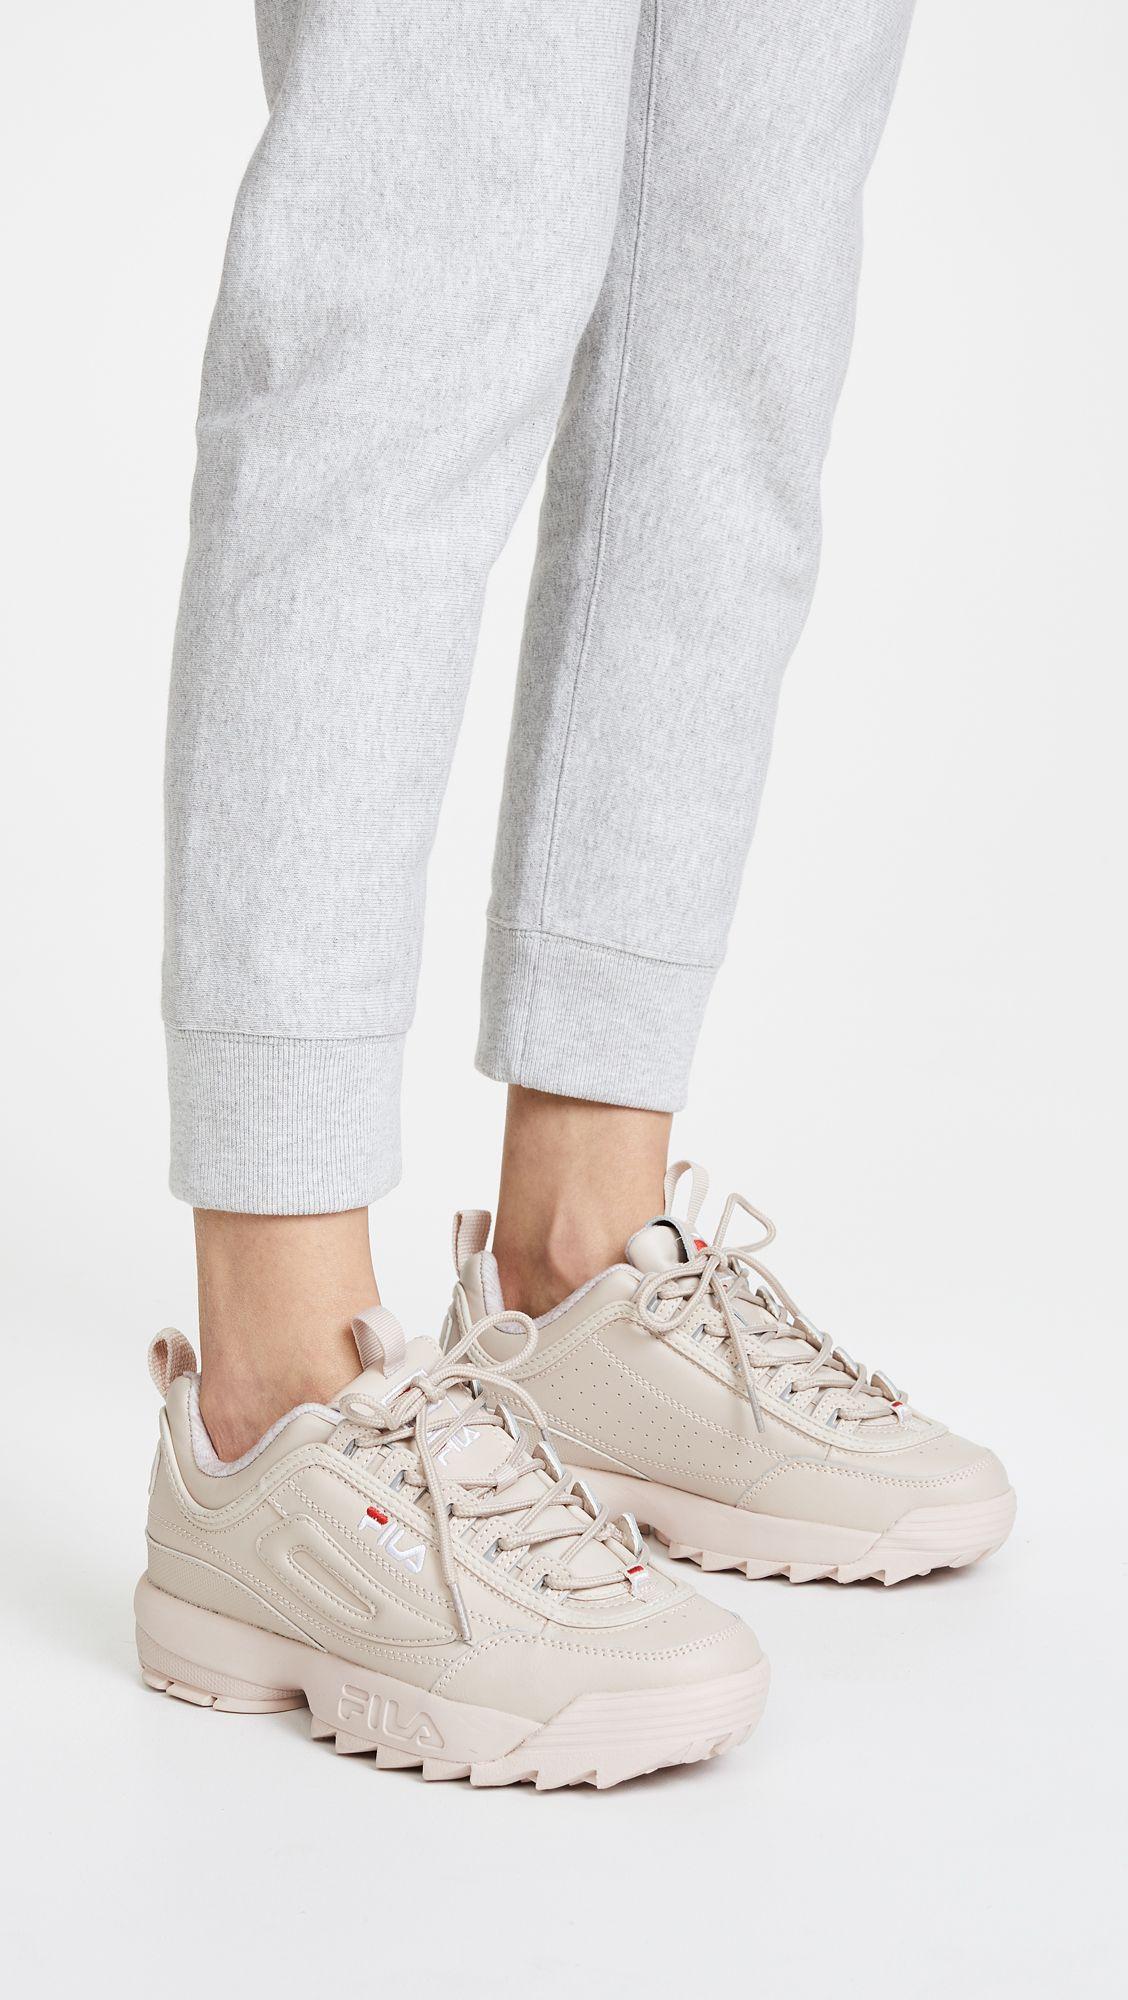 Disruptor II Premium Sneakers | Sneakers, Womens fashion